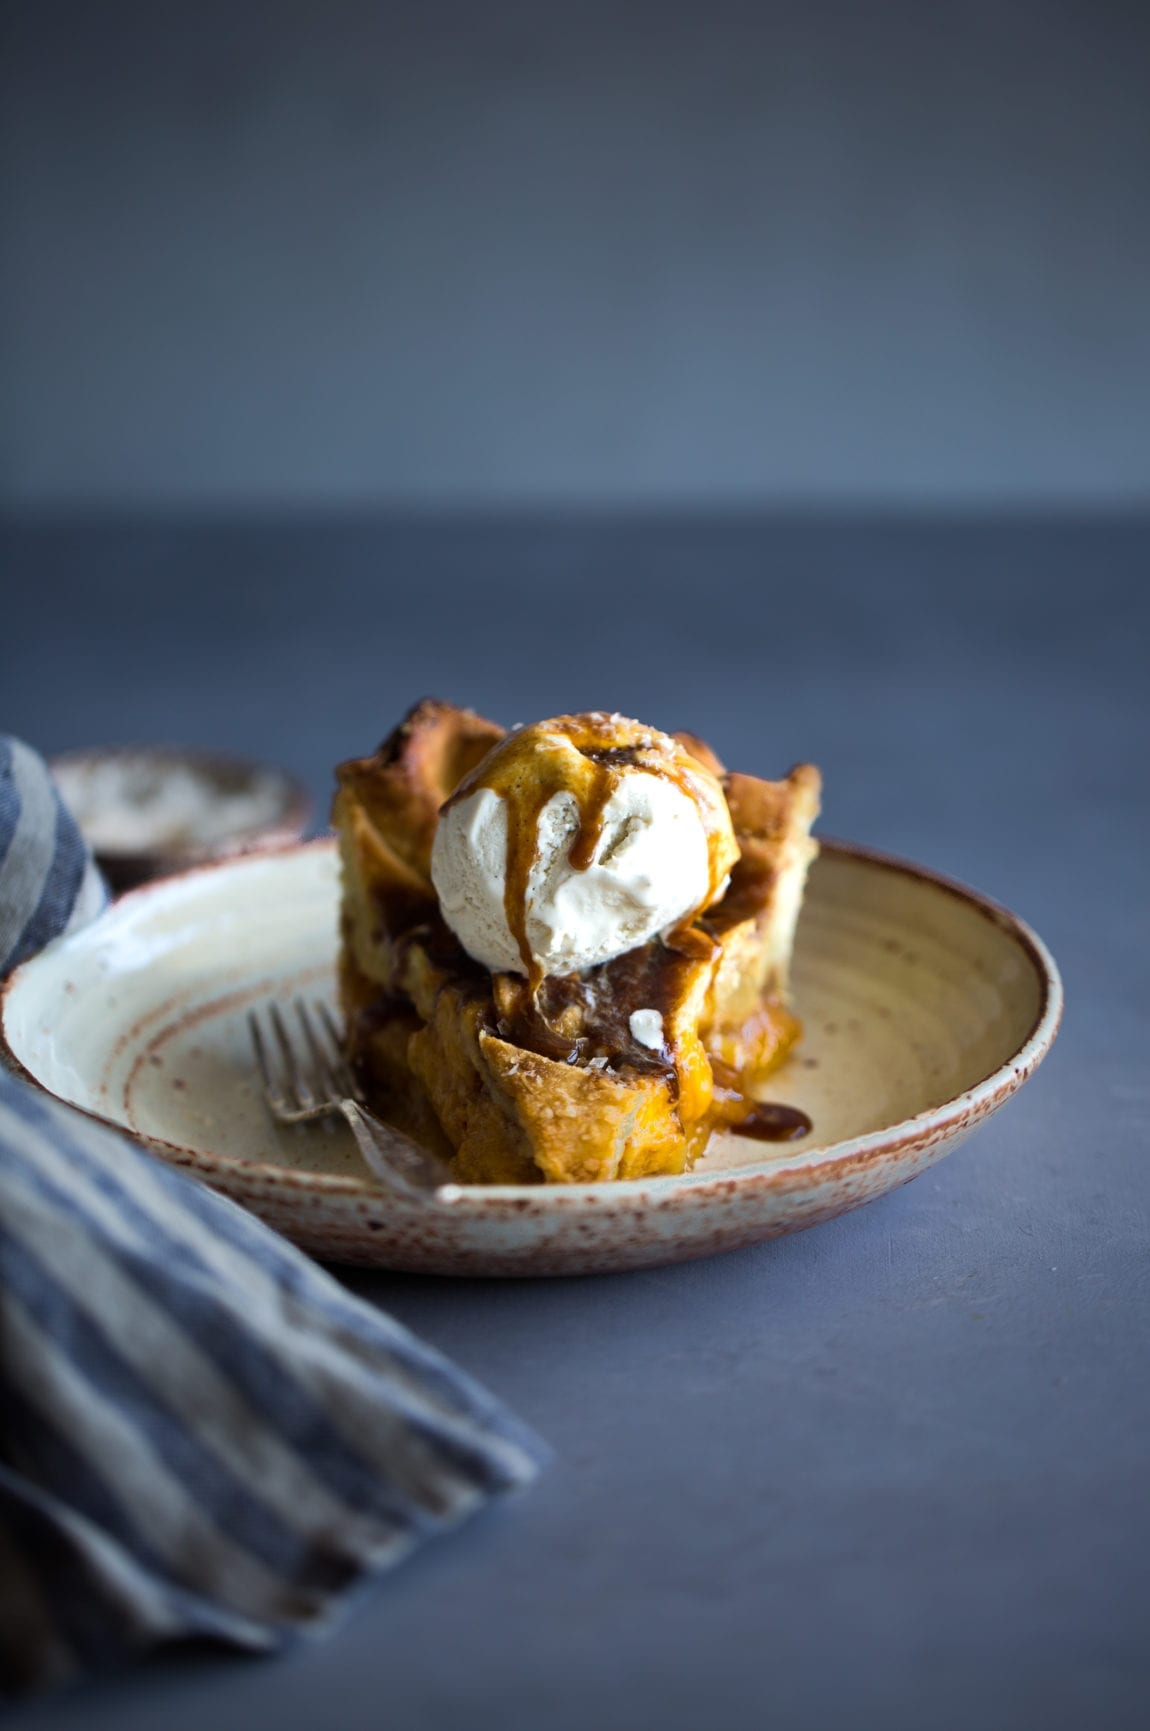 Peach & Salted Coconut Caramel Pie